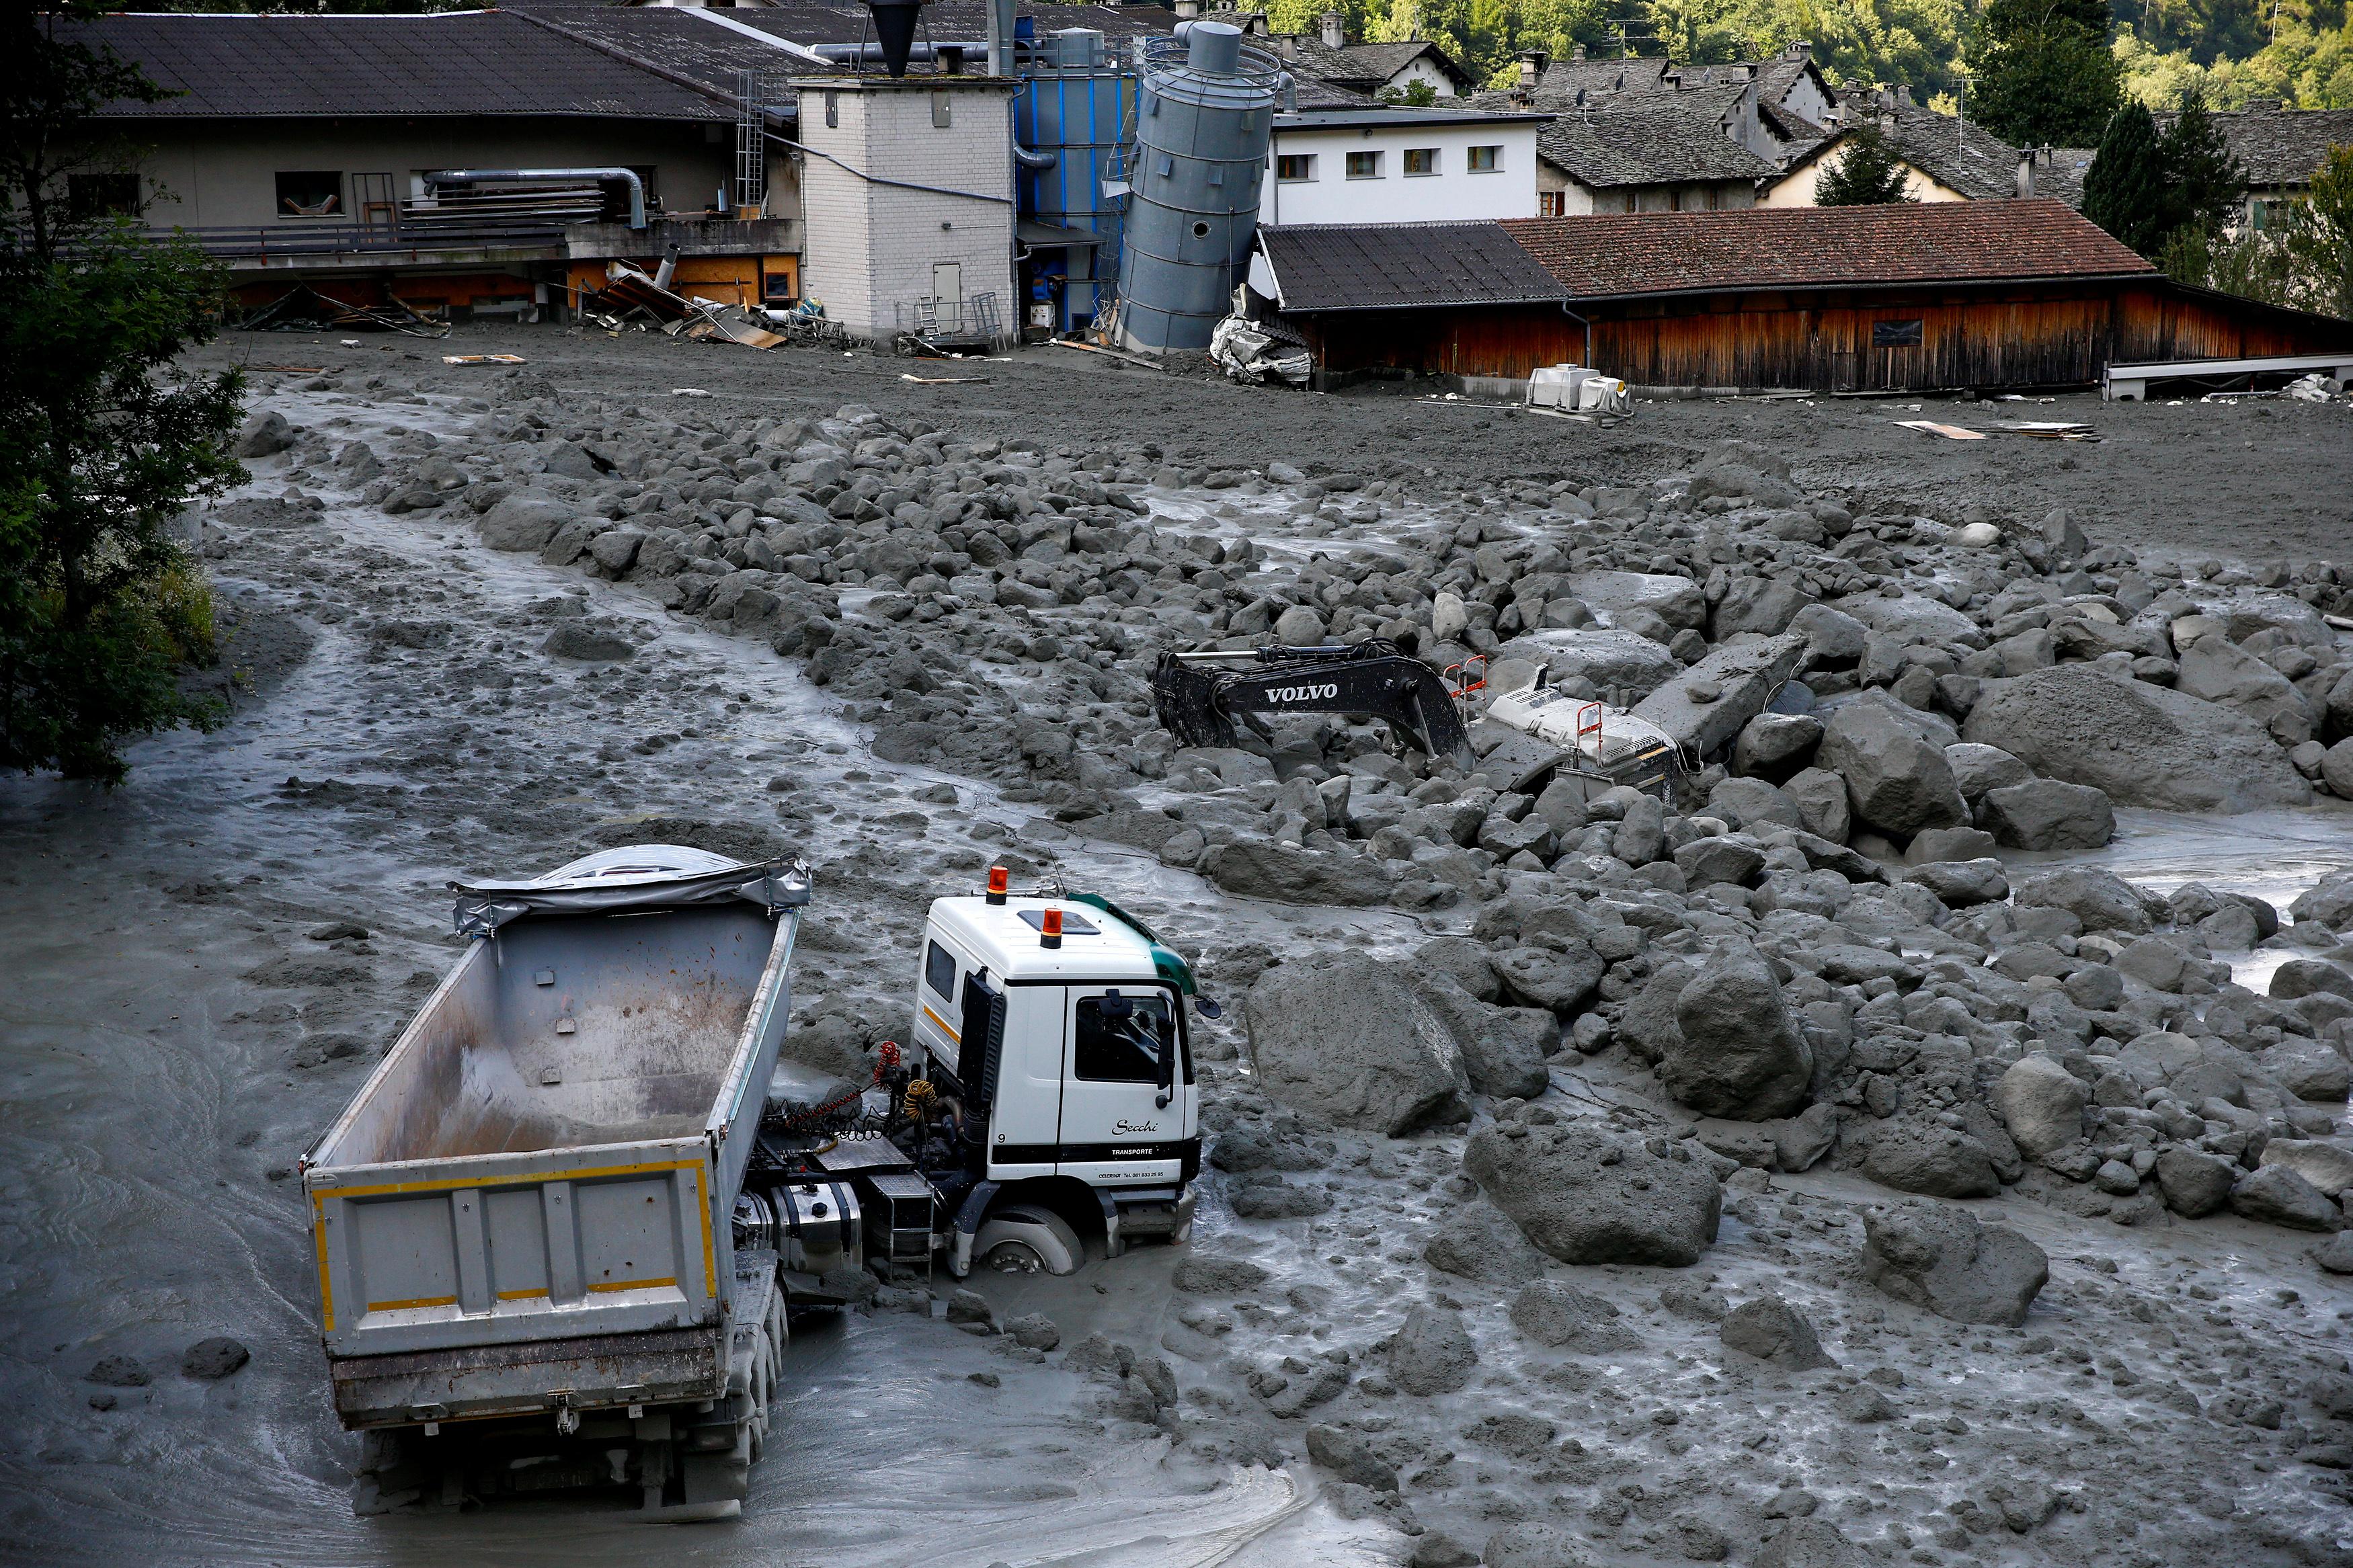 A truck sits in a landslide in the village of Bondo in Switzerland, on Aug. 26, 2017. (REUTERS/Arnd Wiegmann)